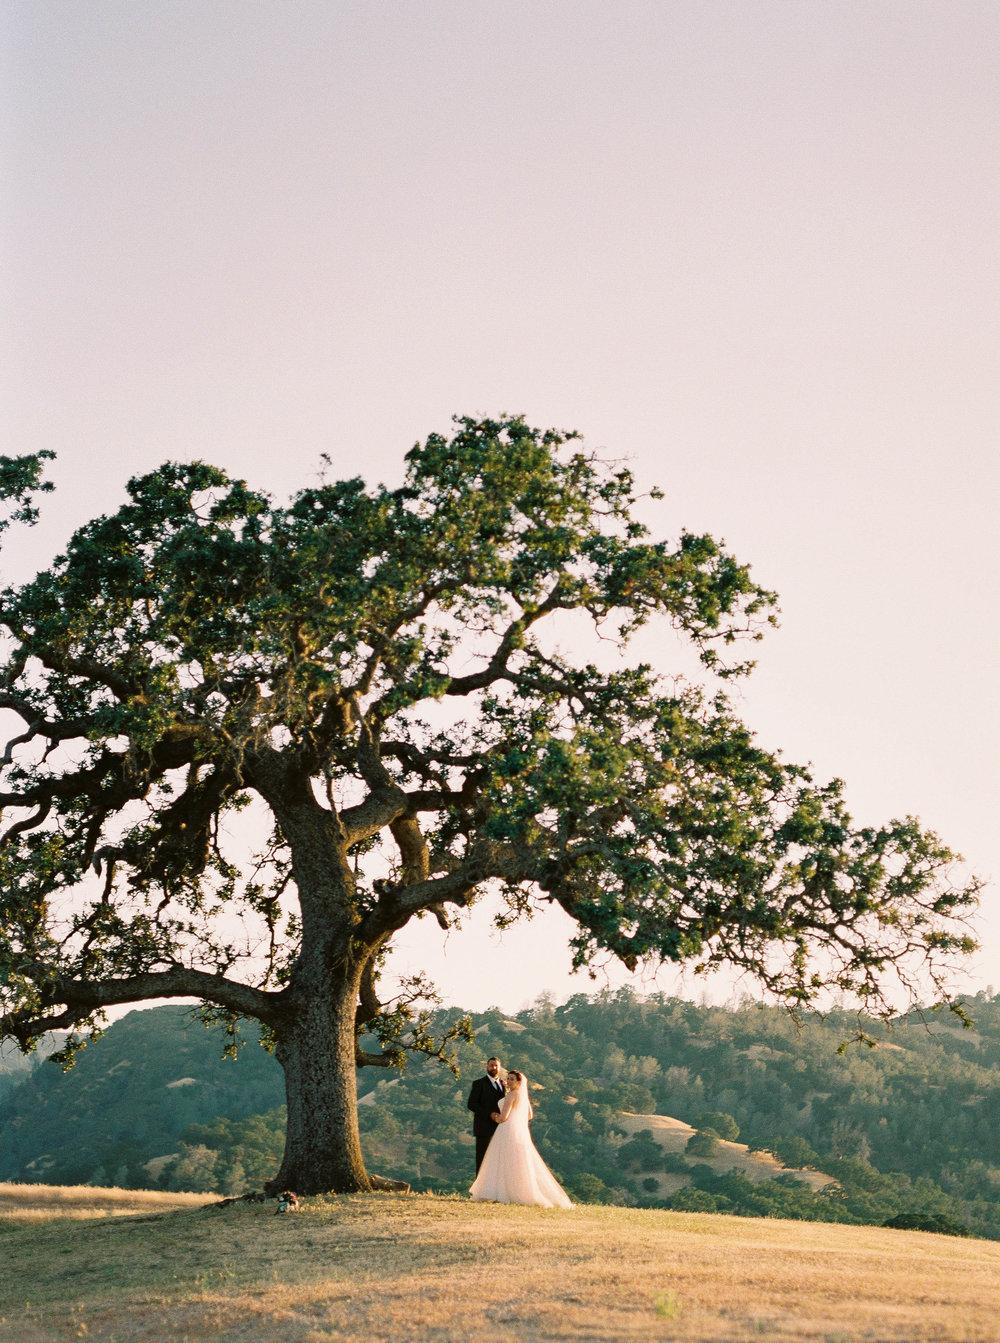 DennisRoyCoronel_Photography_taberranch_Wedding-13.jpg